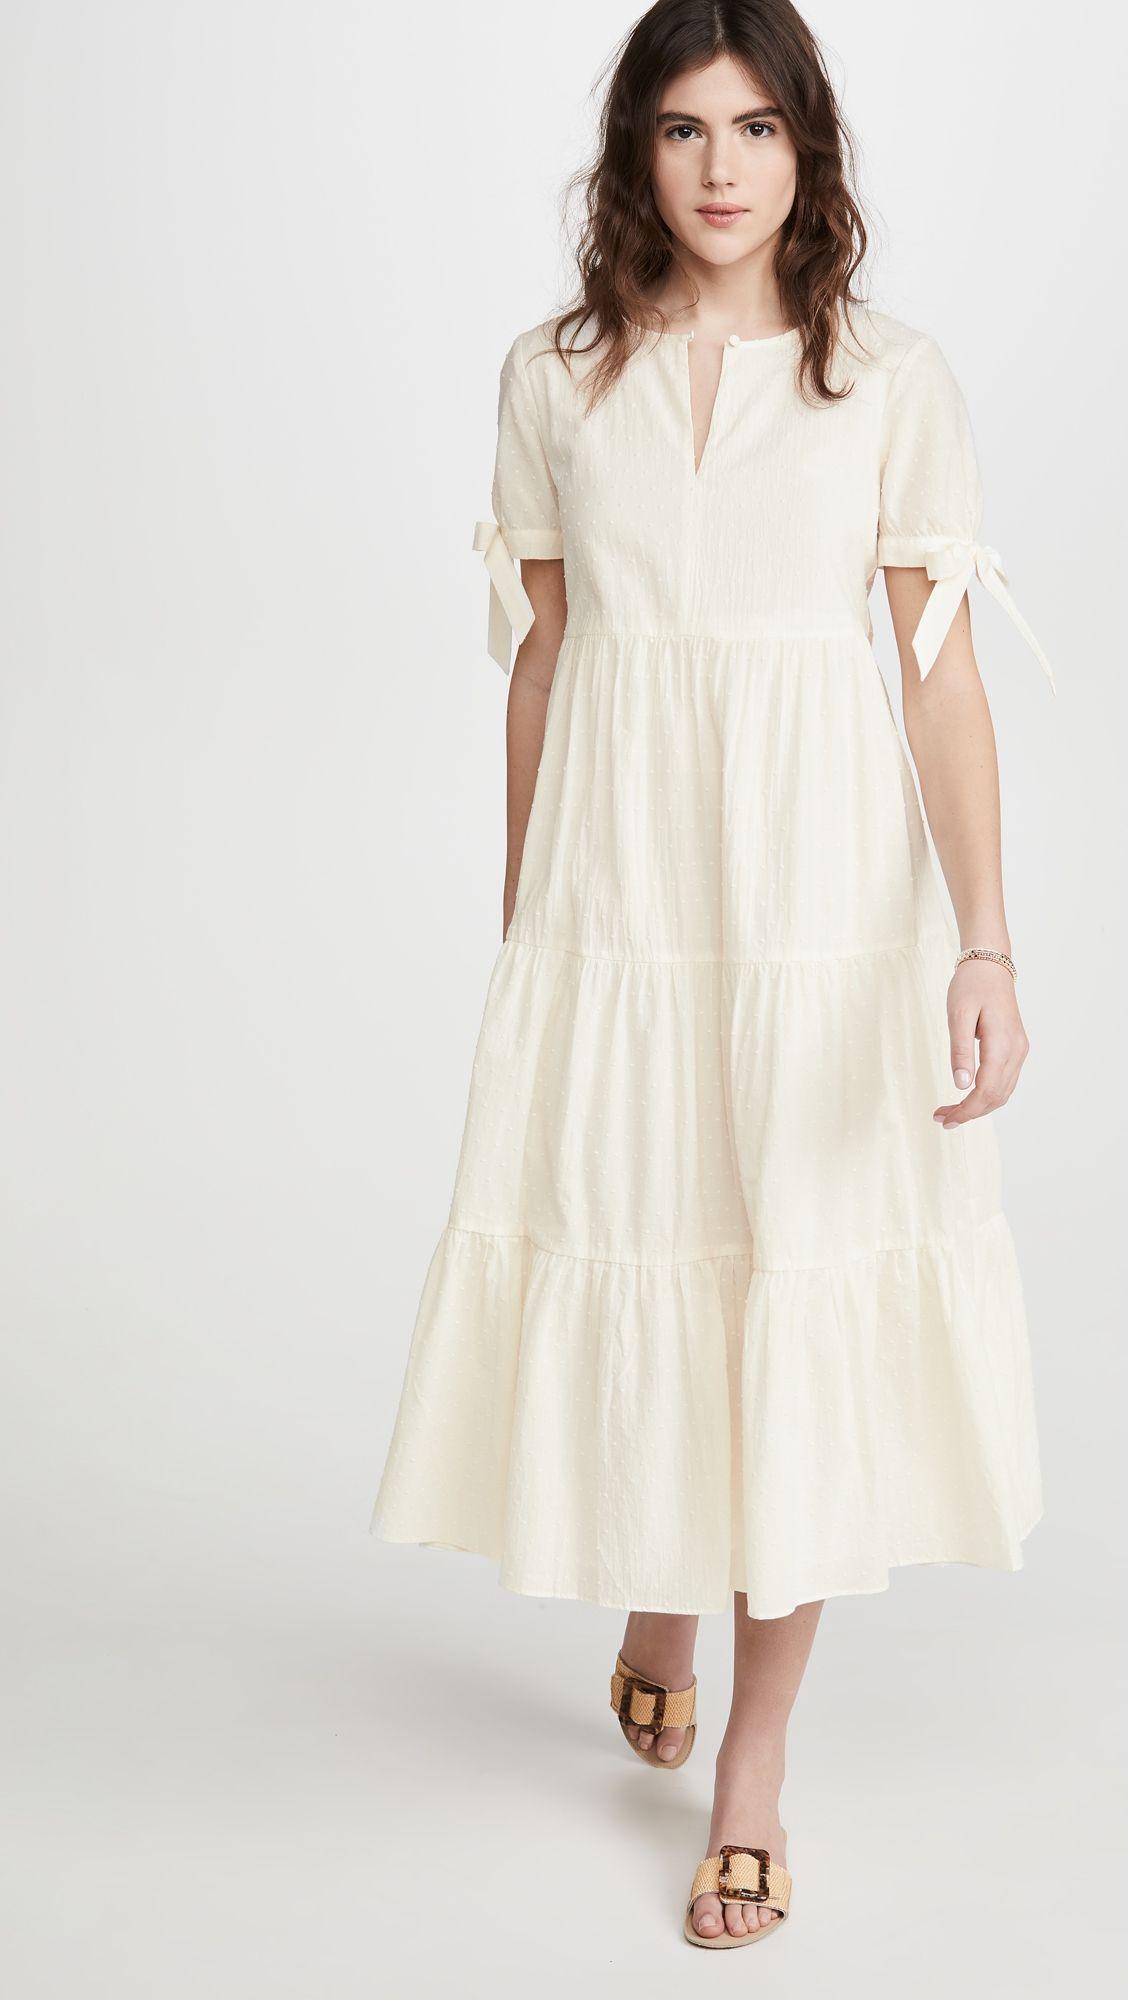 Madewell Tie Sleeve Tiered Midi Dress In Swiss Dot Tiered Midi Dress Midi Dress Dresses [ 2000 x 1128 Pixel ]